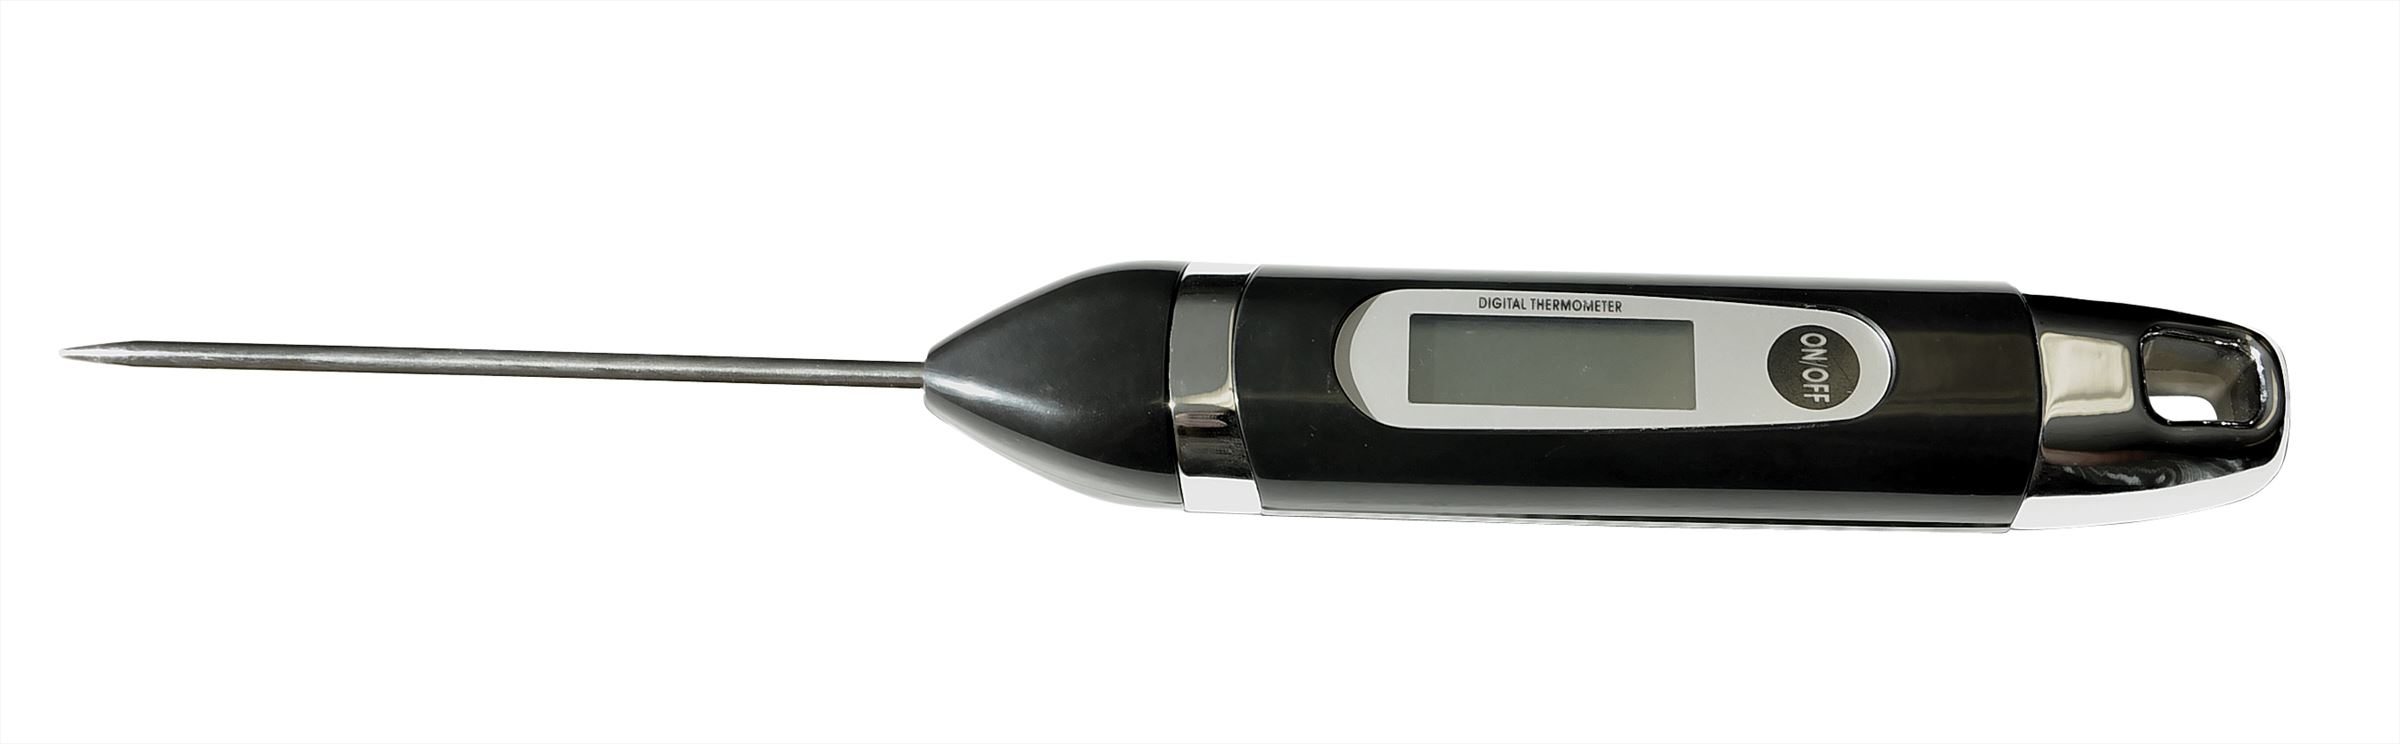 Napoleon barbecues Napoleon digitale thermometer